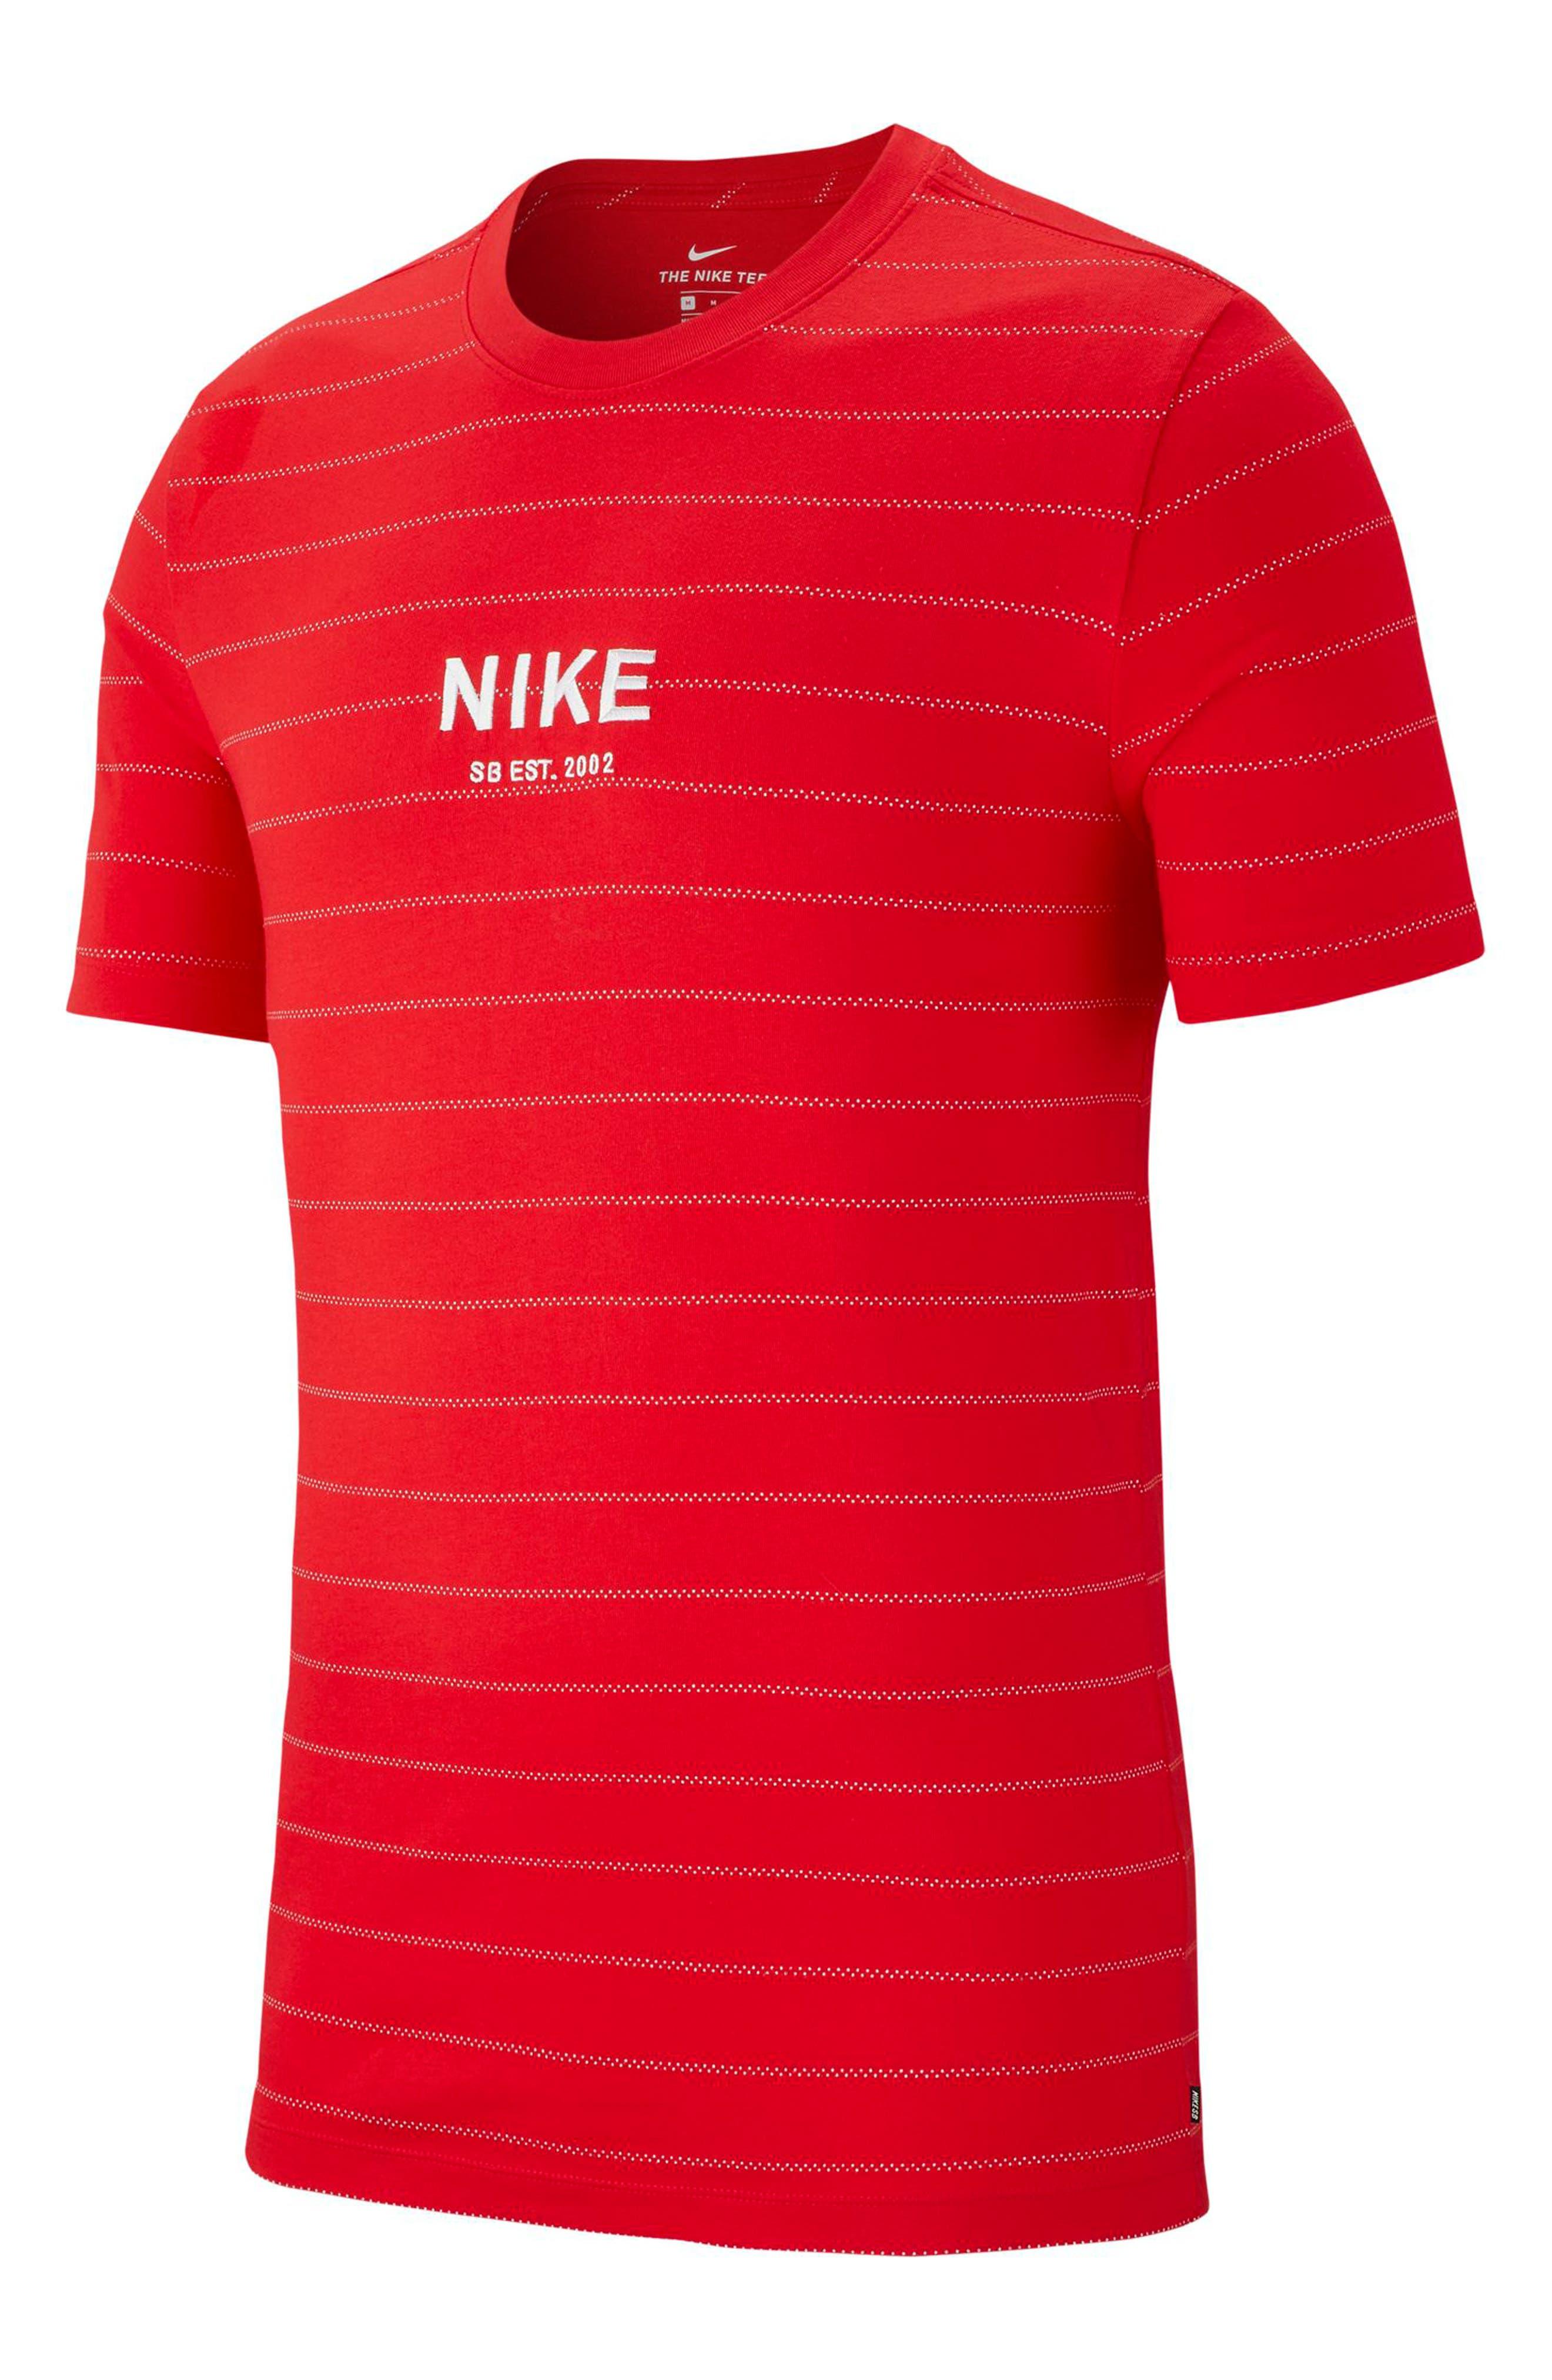 9f7aa92bc Men's NIKE SB T-Shirts, Tank Tops, & Graphic Tees | Nordstrom